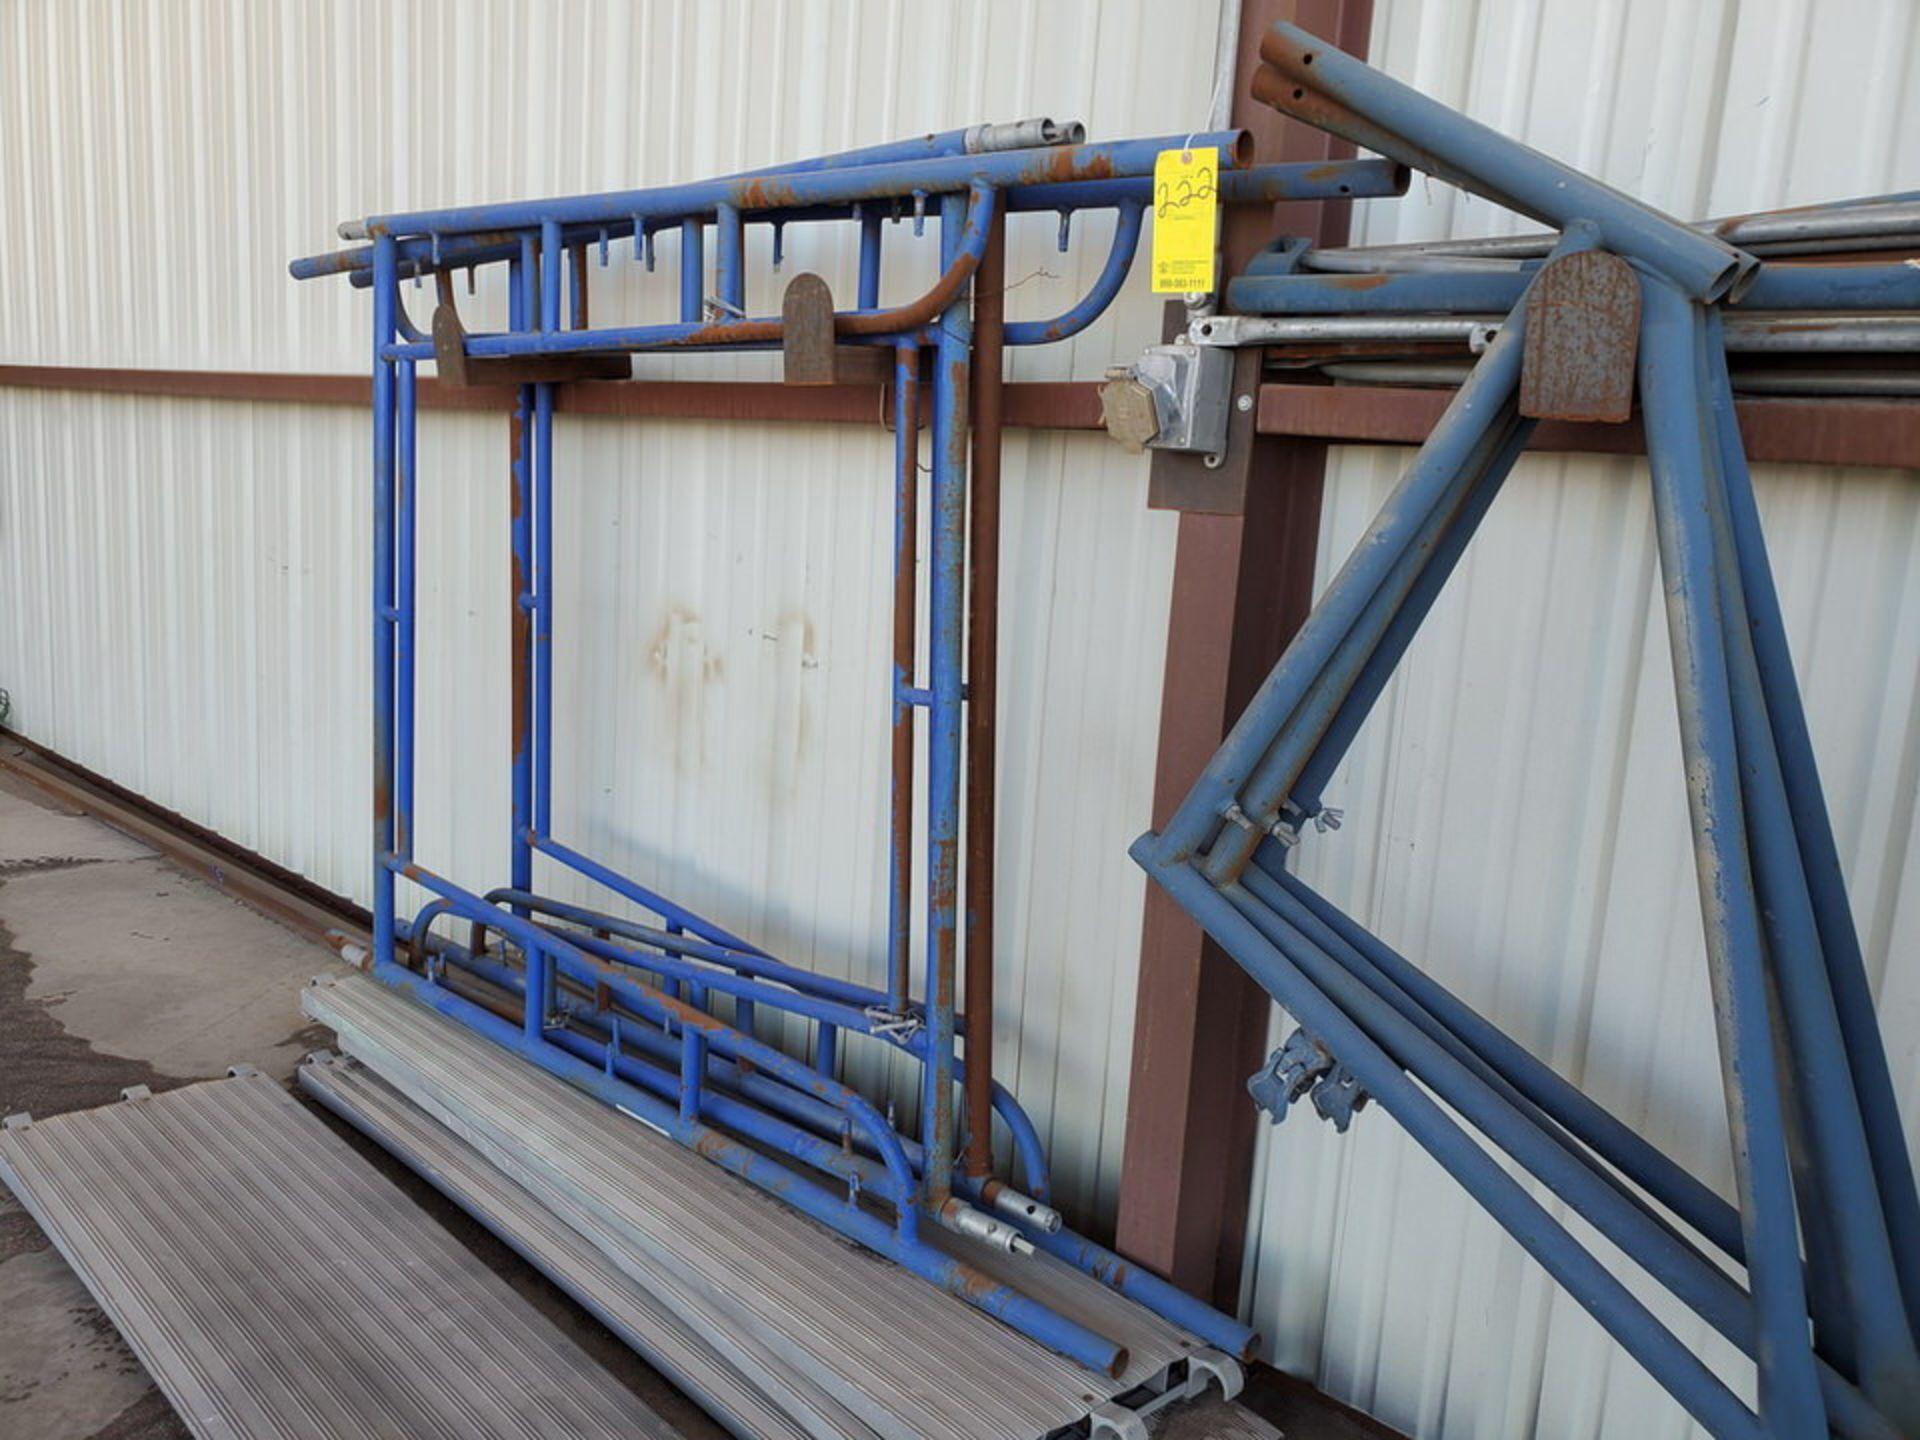 Scaffold W' 16' Fixed Alum. Ladder - Image 8 of 10